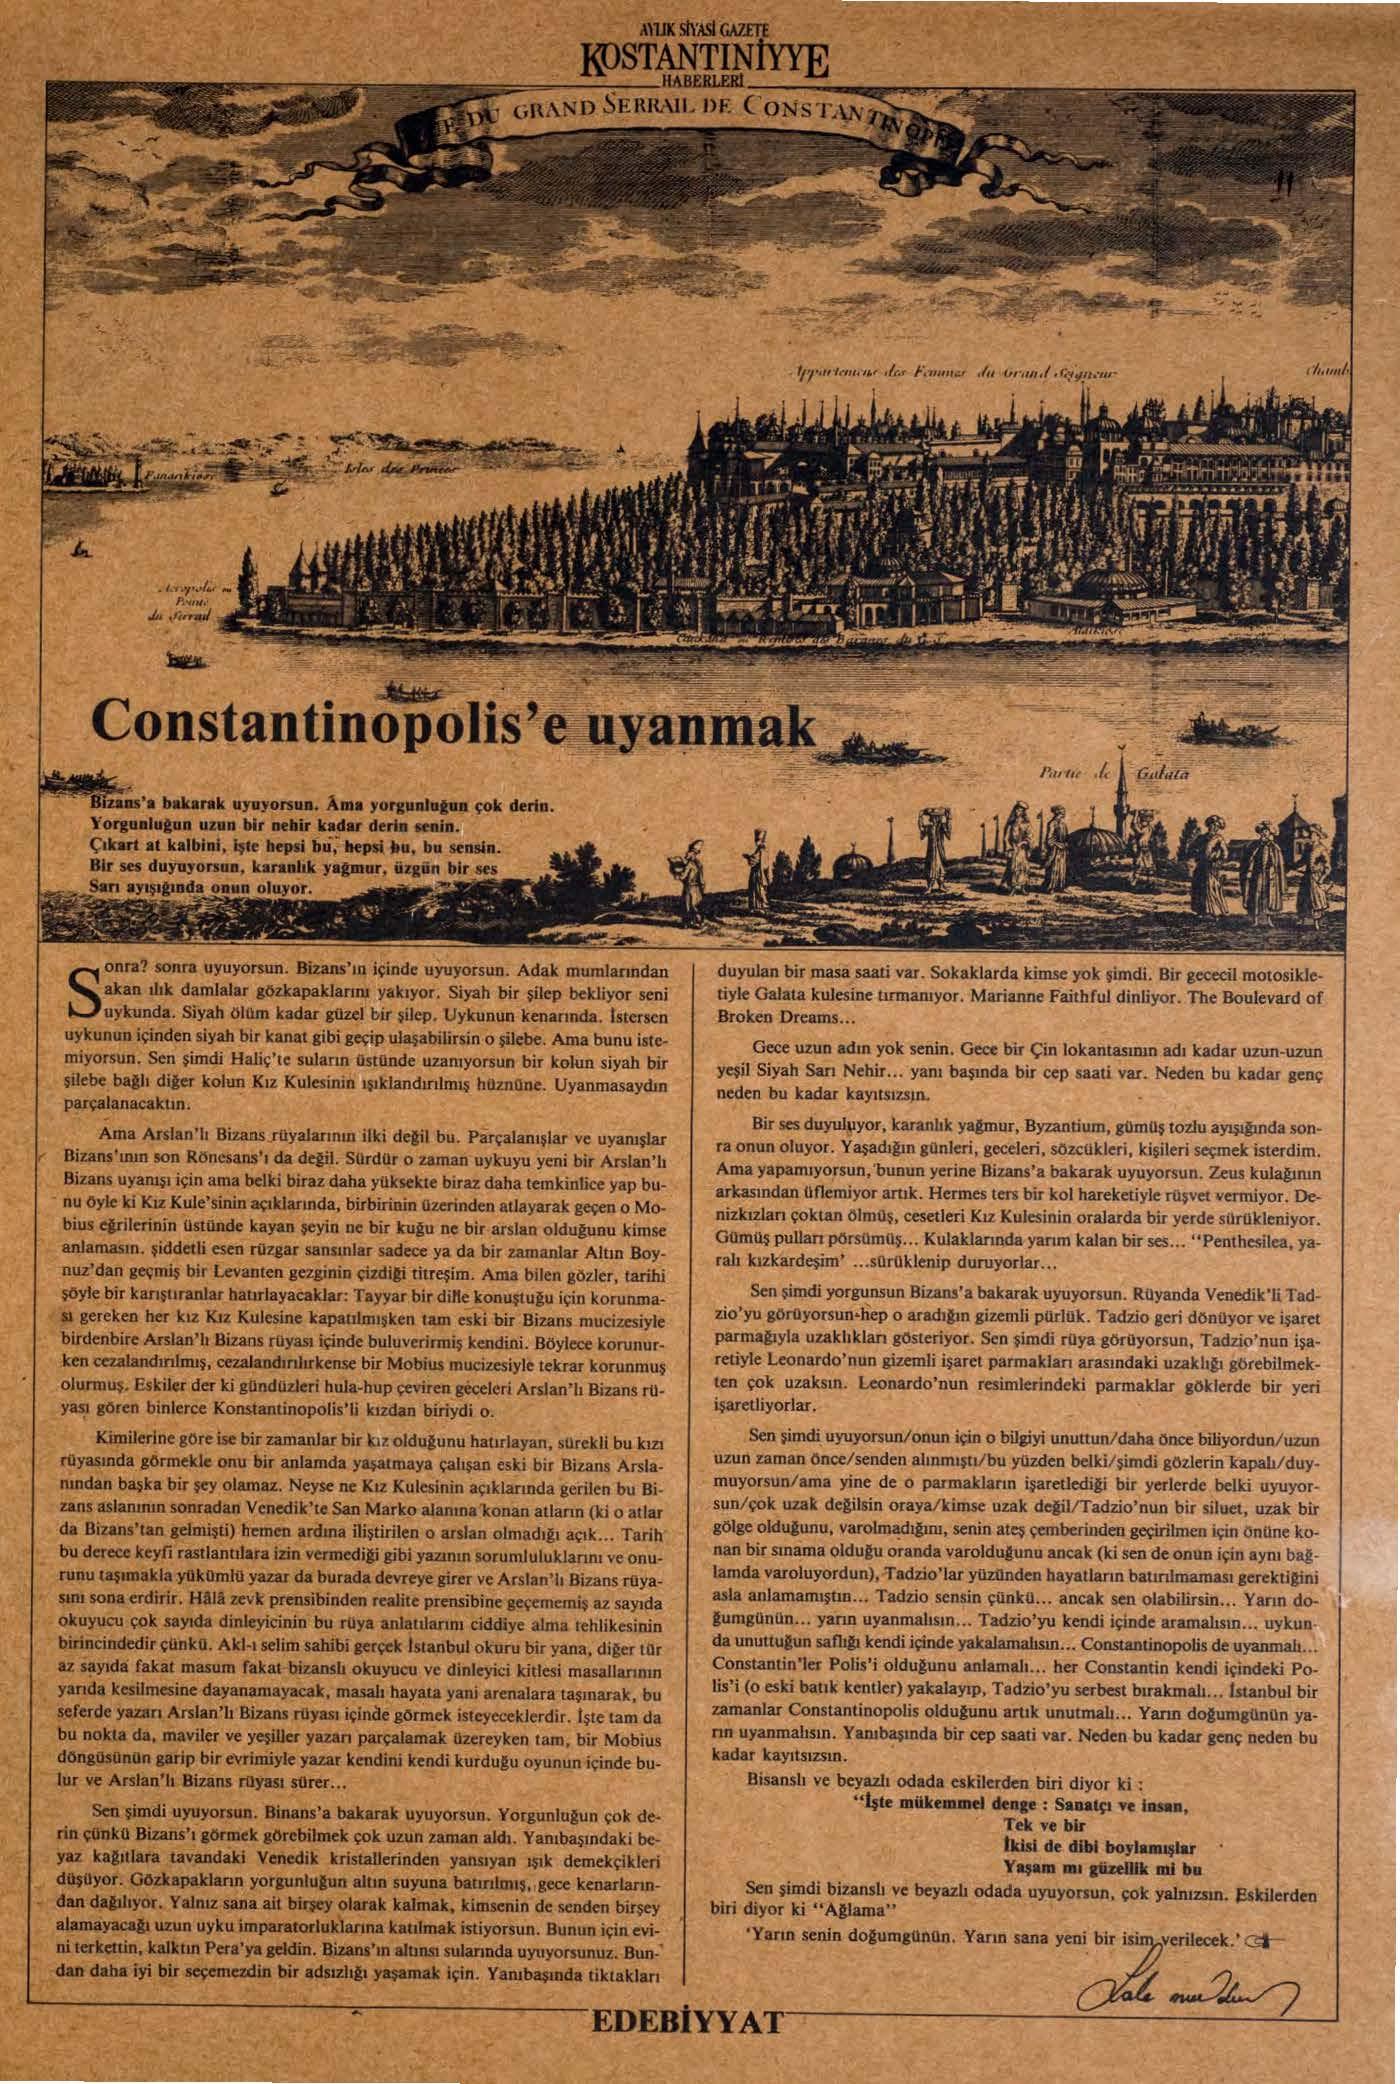 Constantinopol is'e Uyanmak